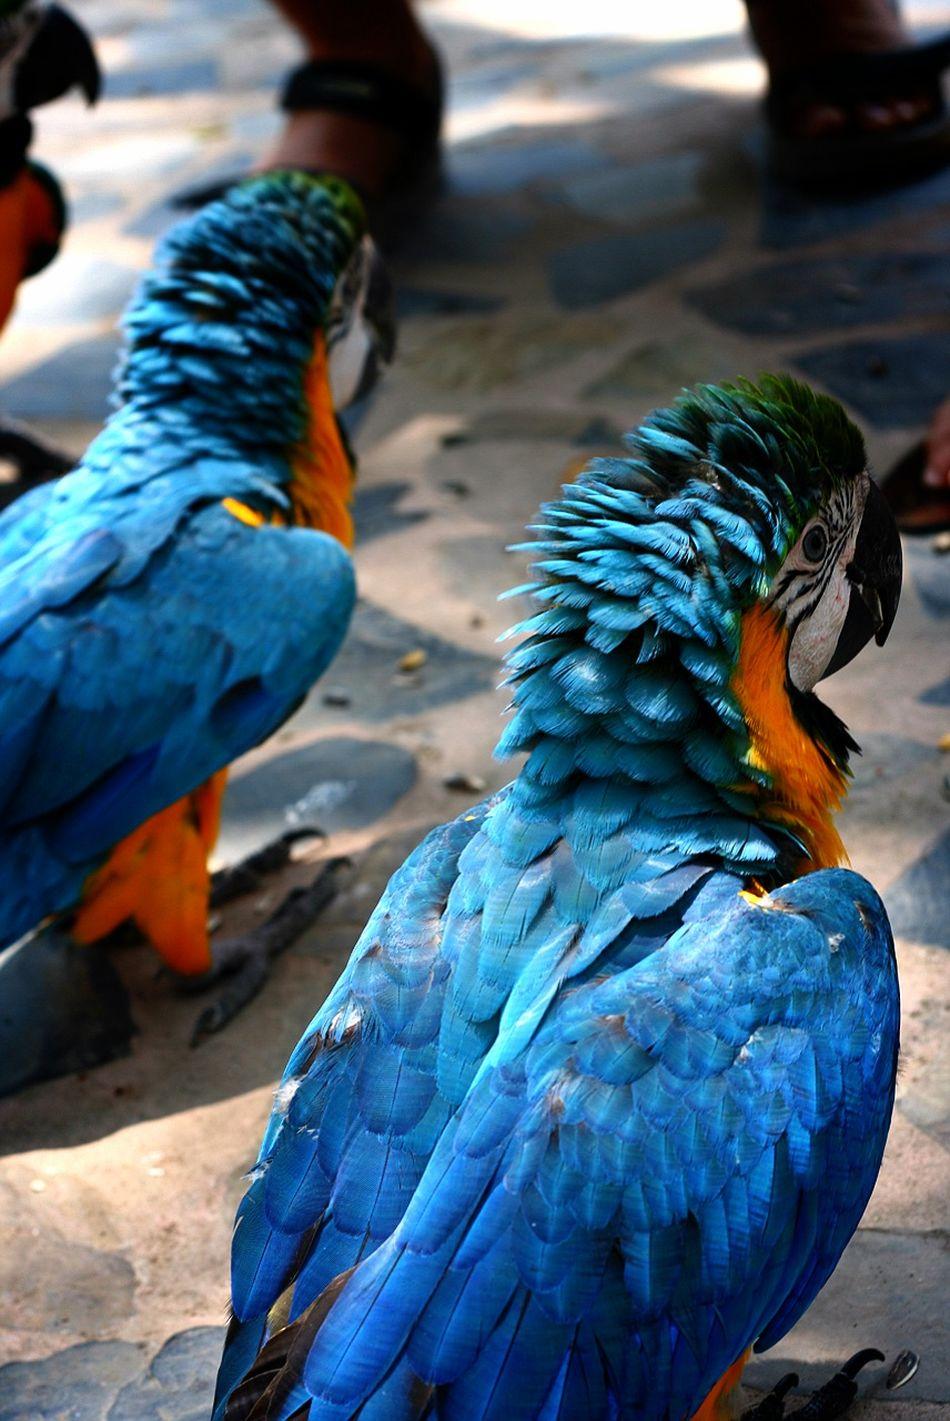 Angrybirds Very Talkative Birds Taveling Thailand